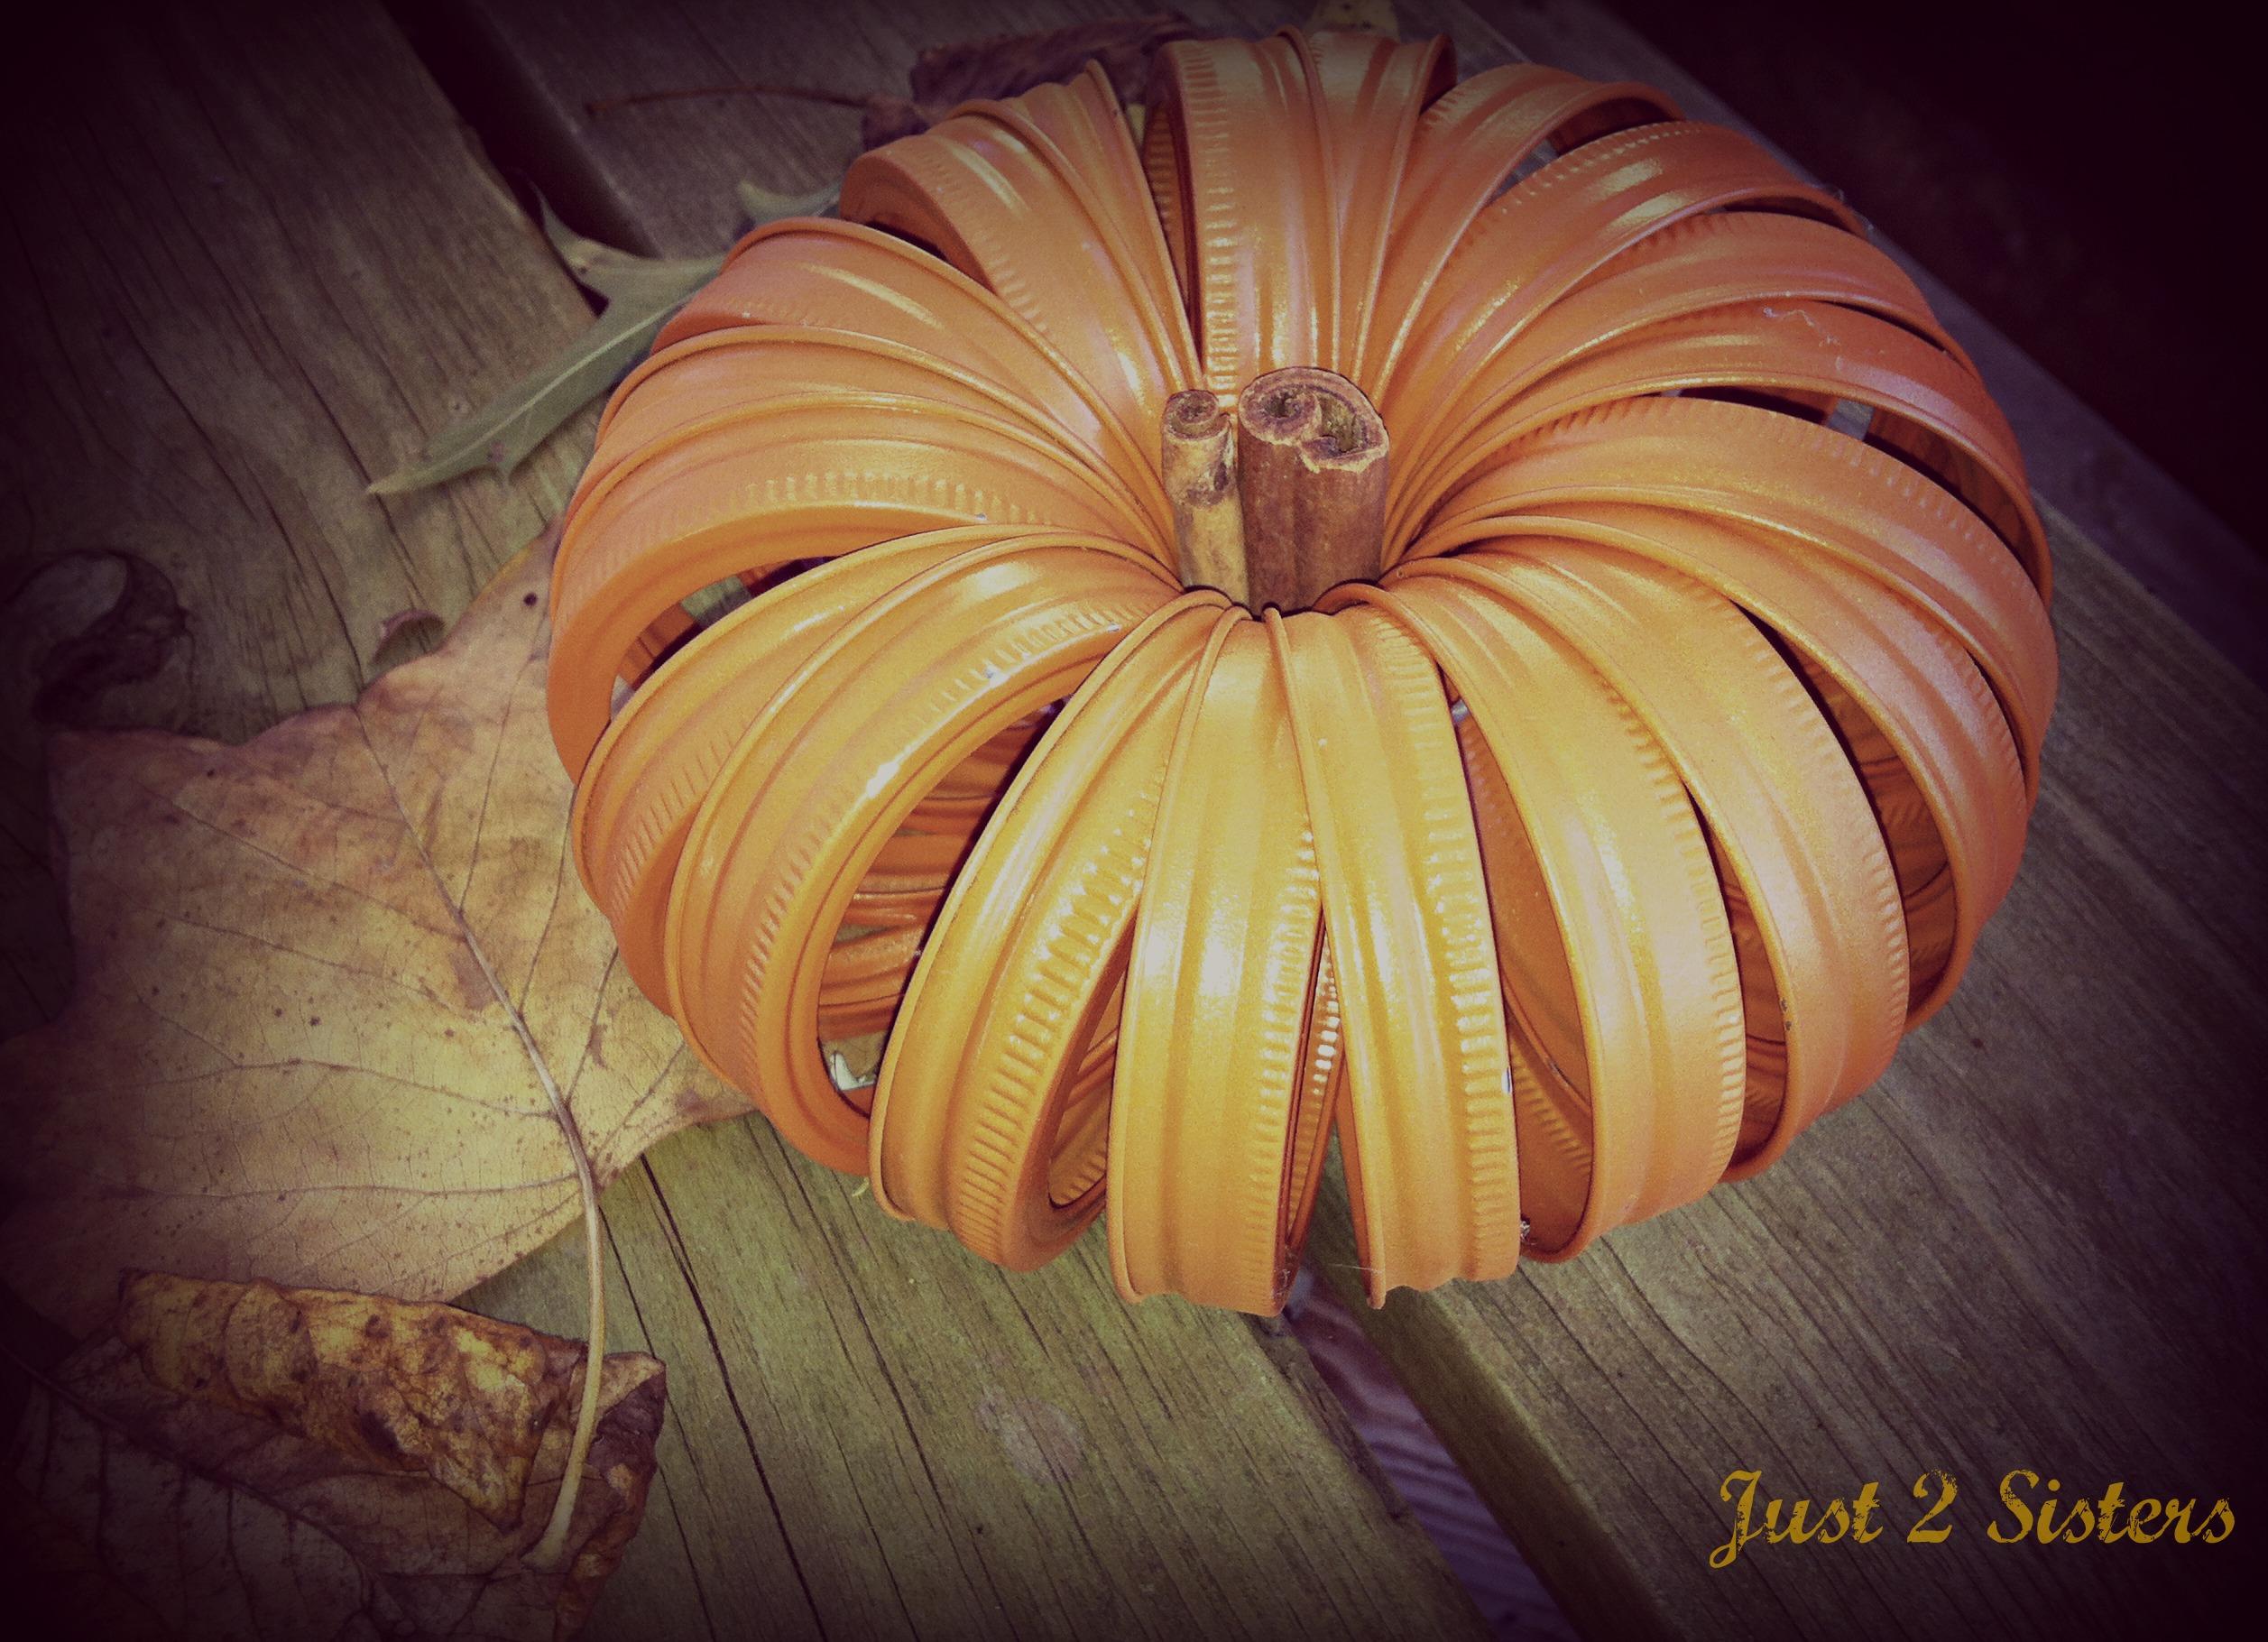 jar-ring-pumpkin-3